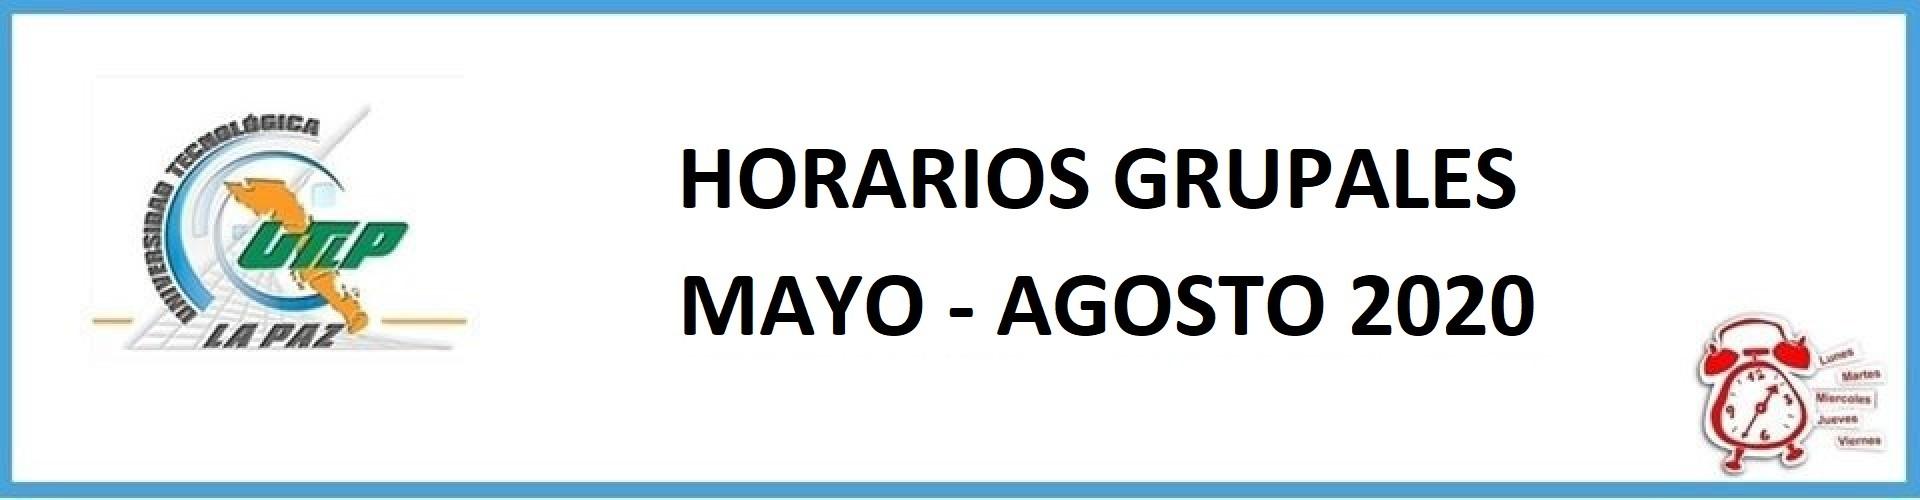 Horarios grupales Mayo - Agosto 2020